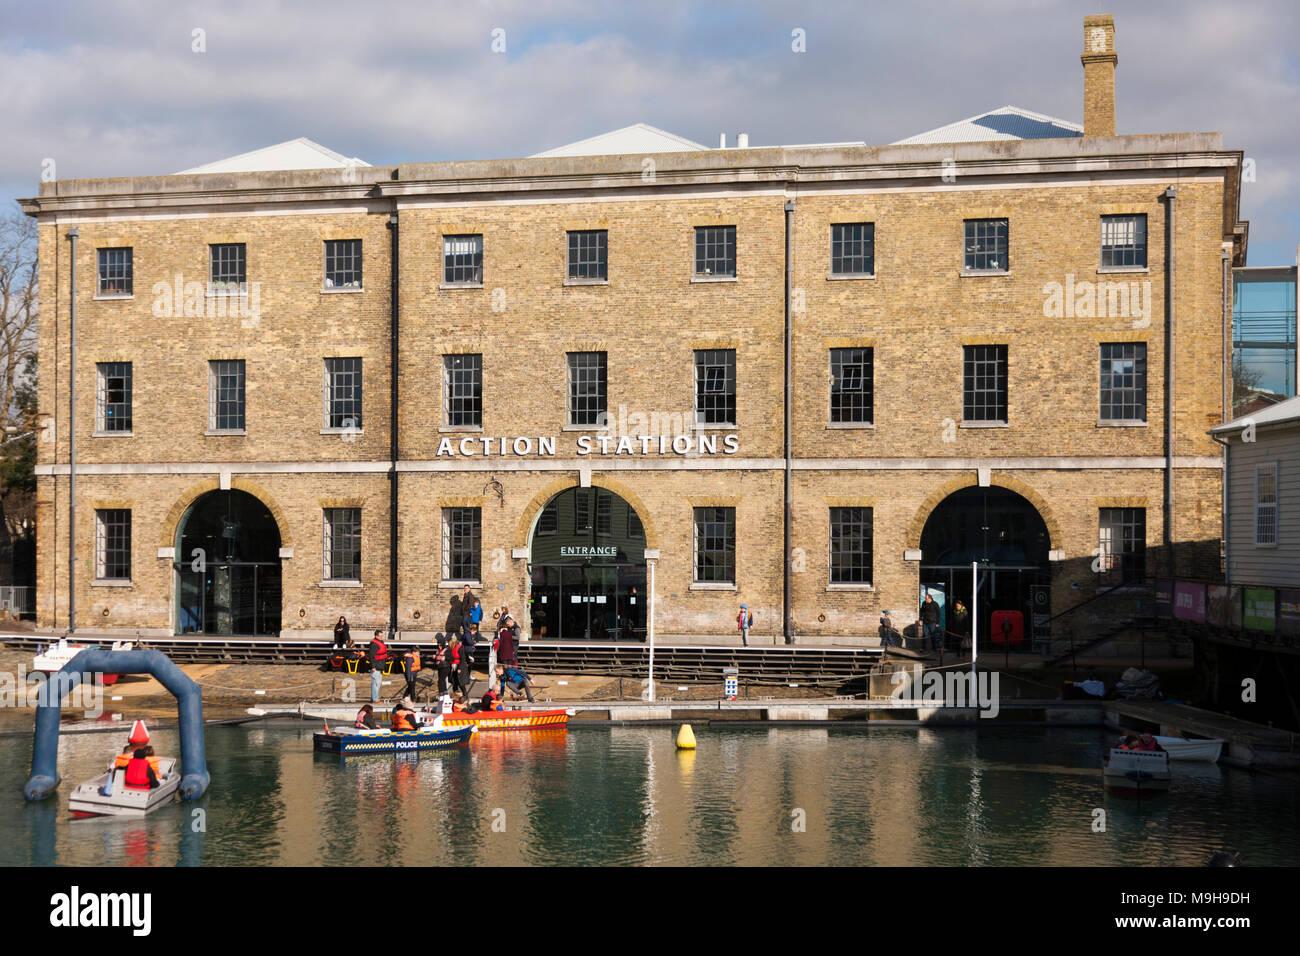 Action Stations at Portsmouth Historic Dockyard, Portsmouth, UK. (95) - Stock Image